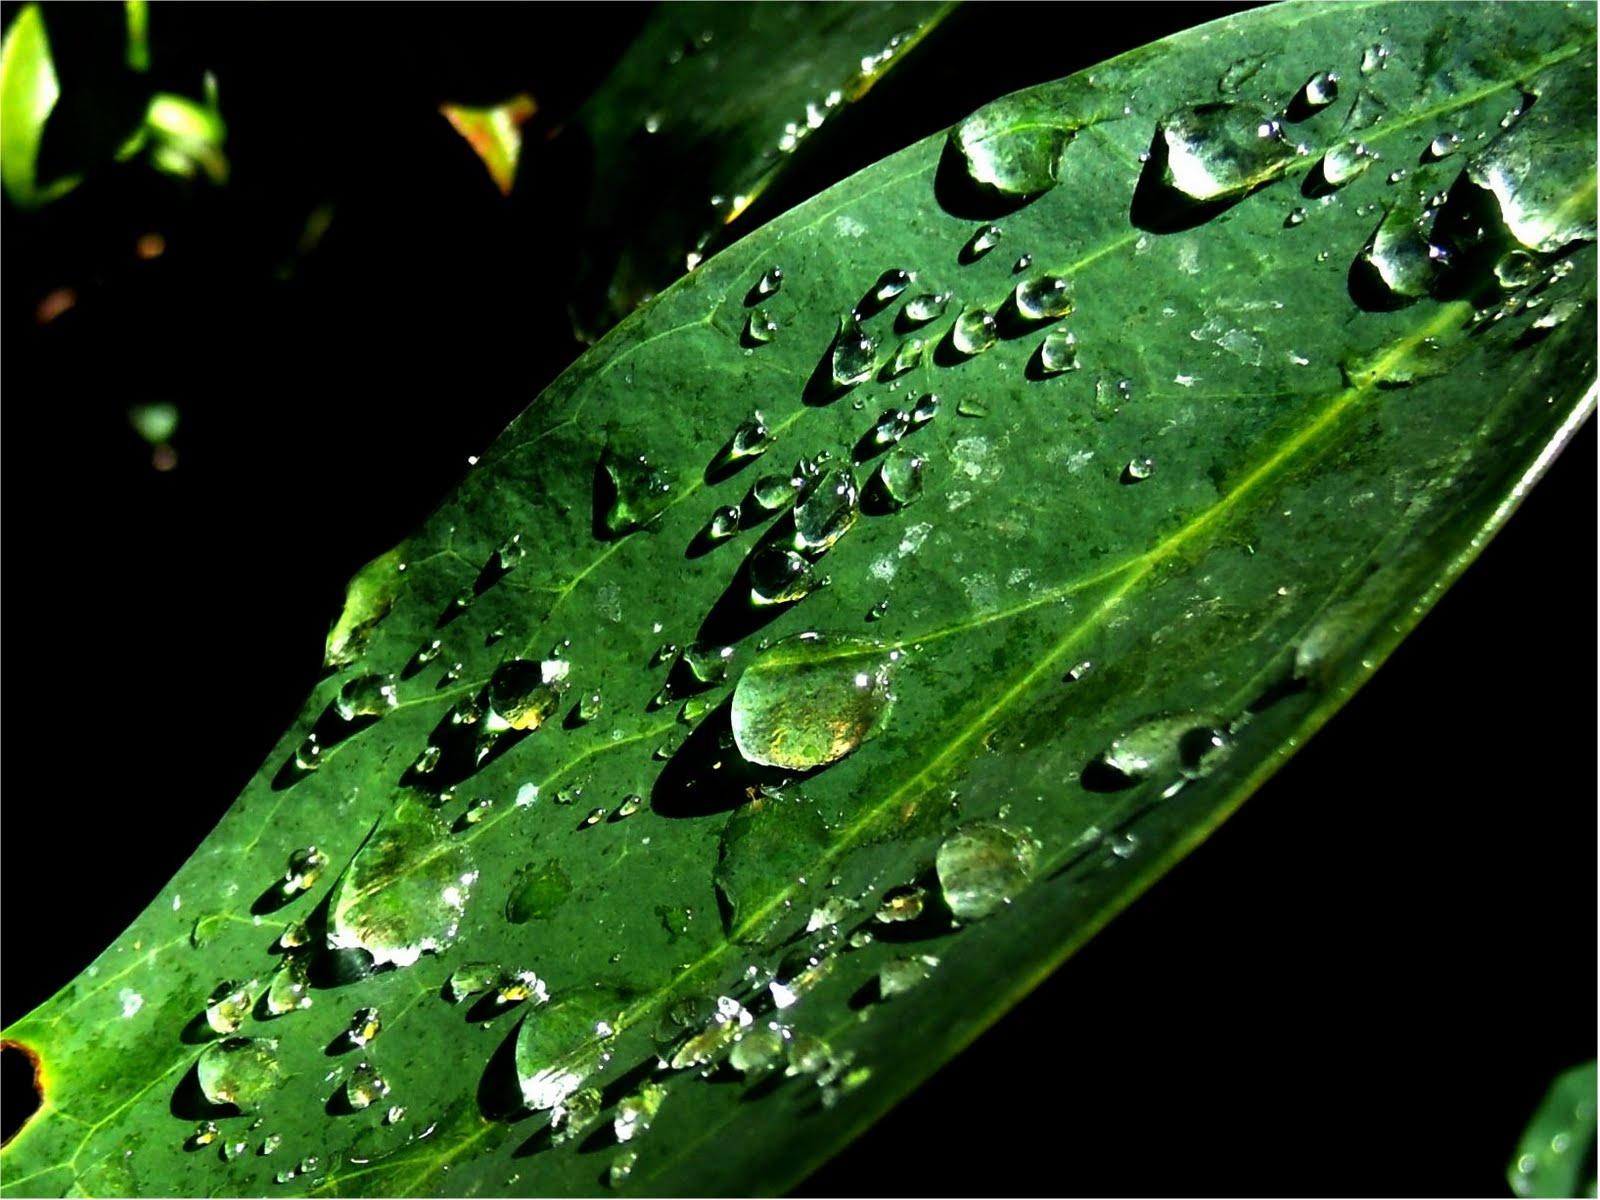 Poetic Shutterbug: Watery Wednesday - Dew Drops On Leaf